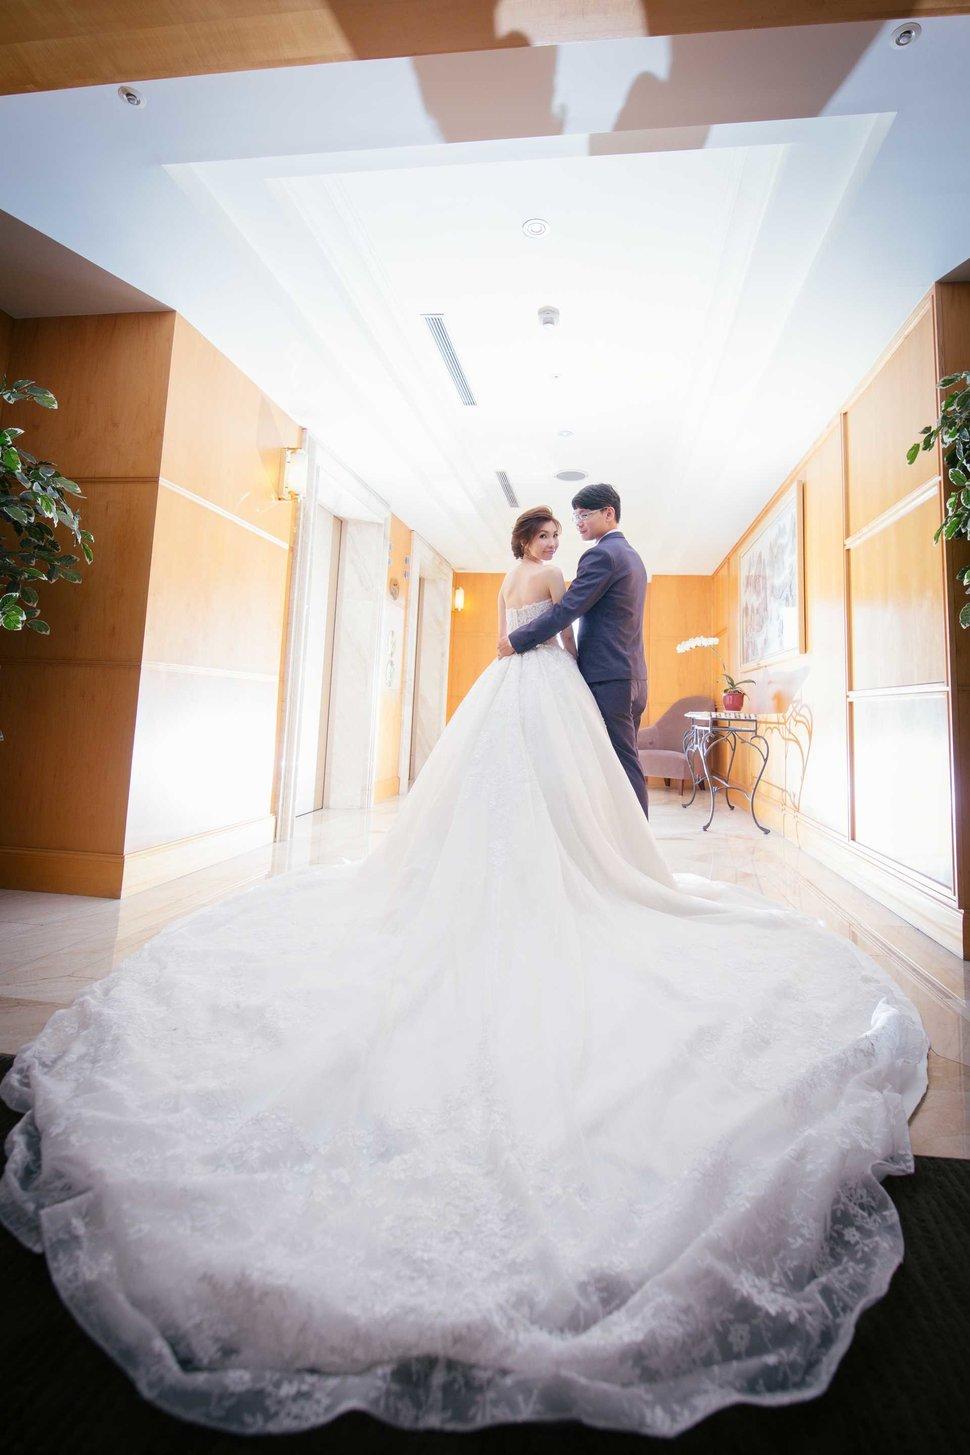 Wedding_Photo_2017_-009 - 高雄婚攝Luke-路克《結婚吧》